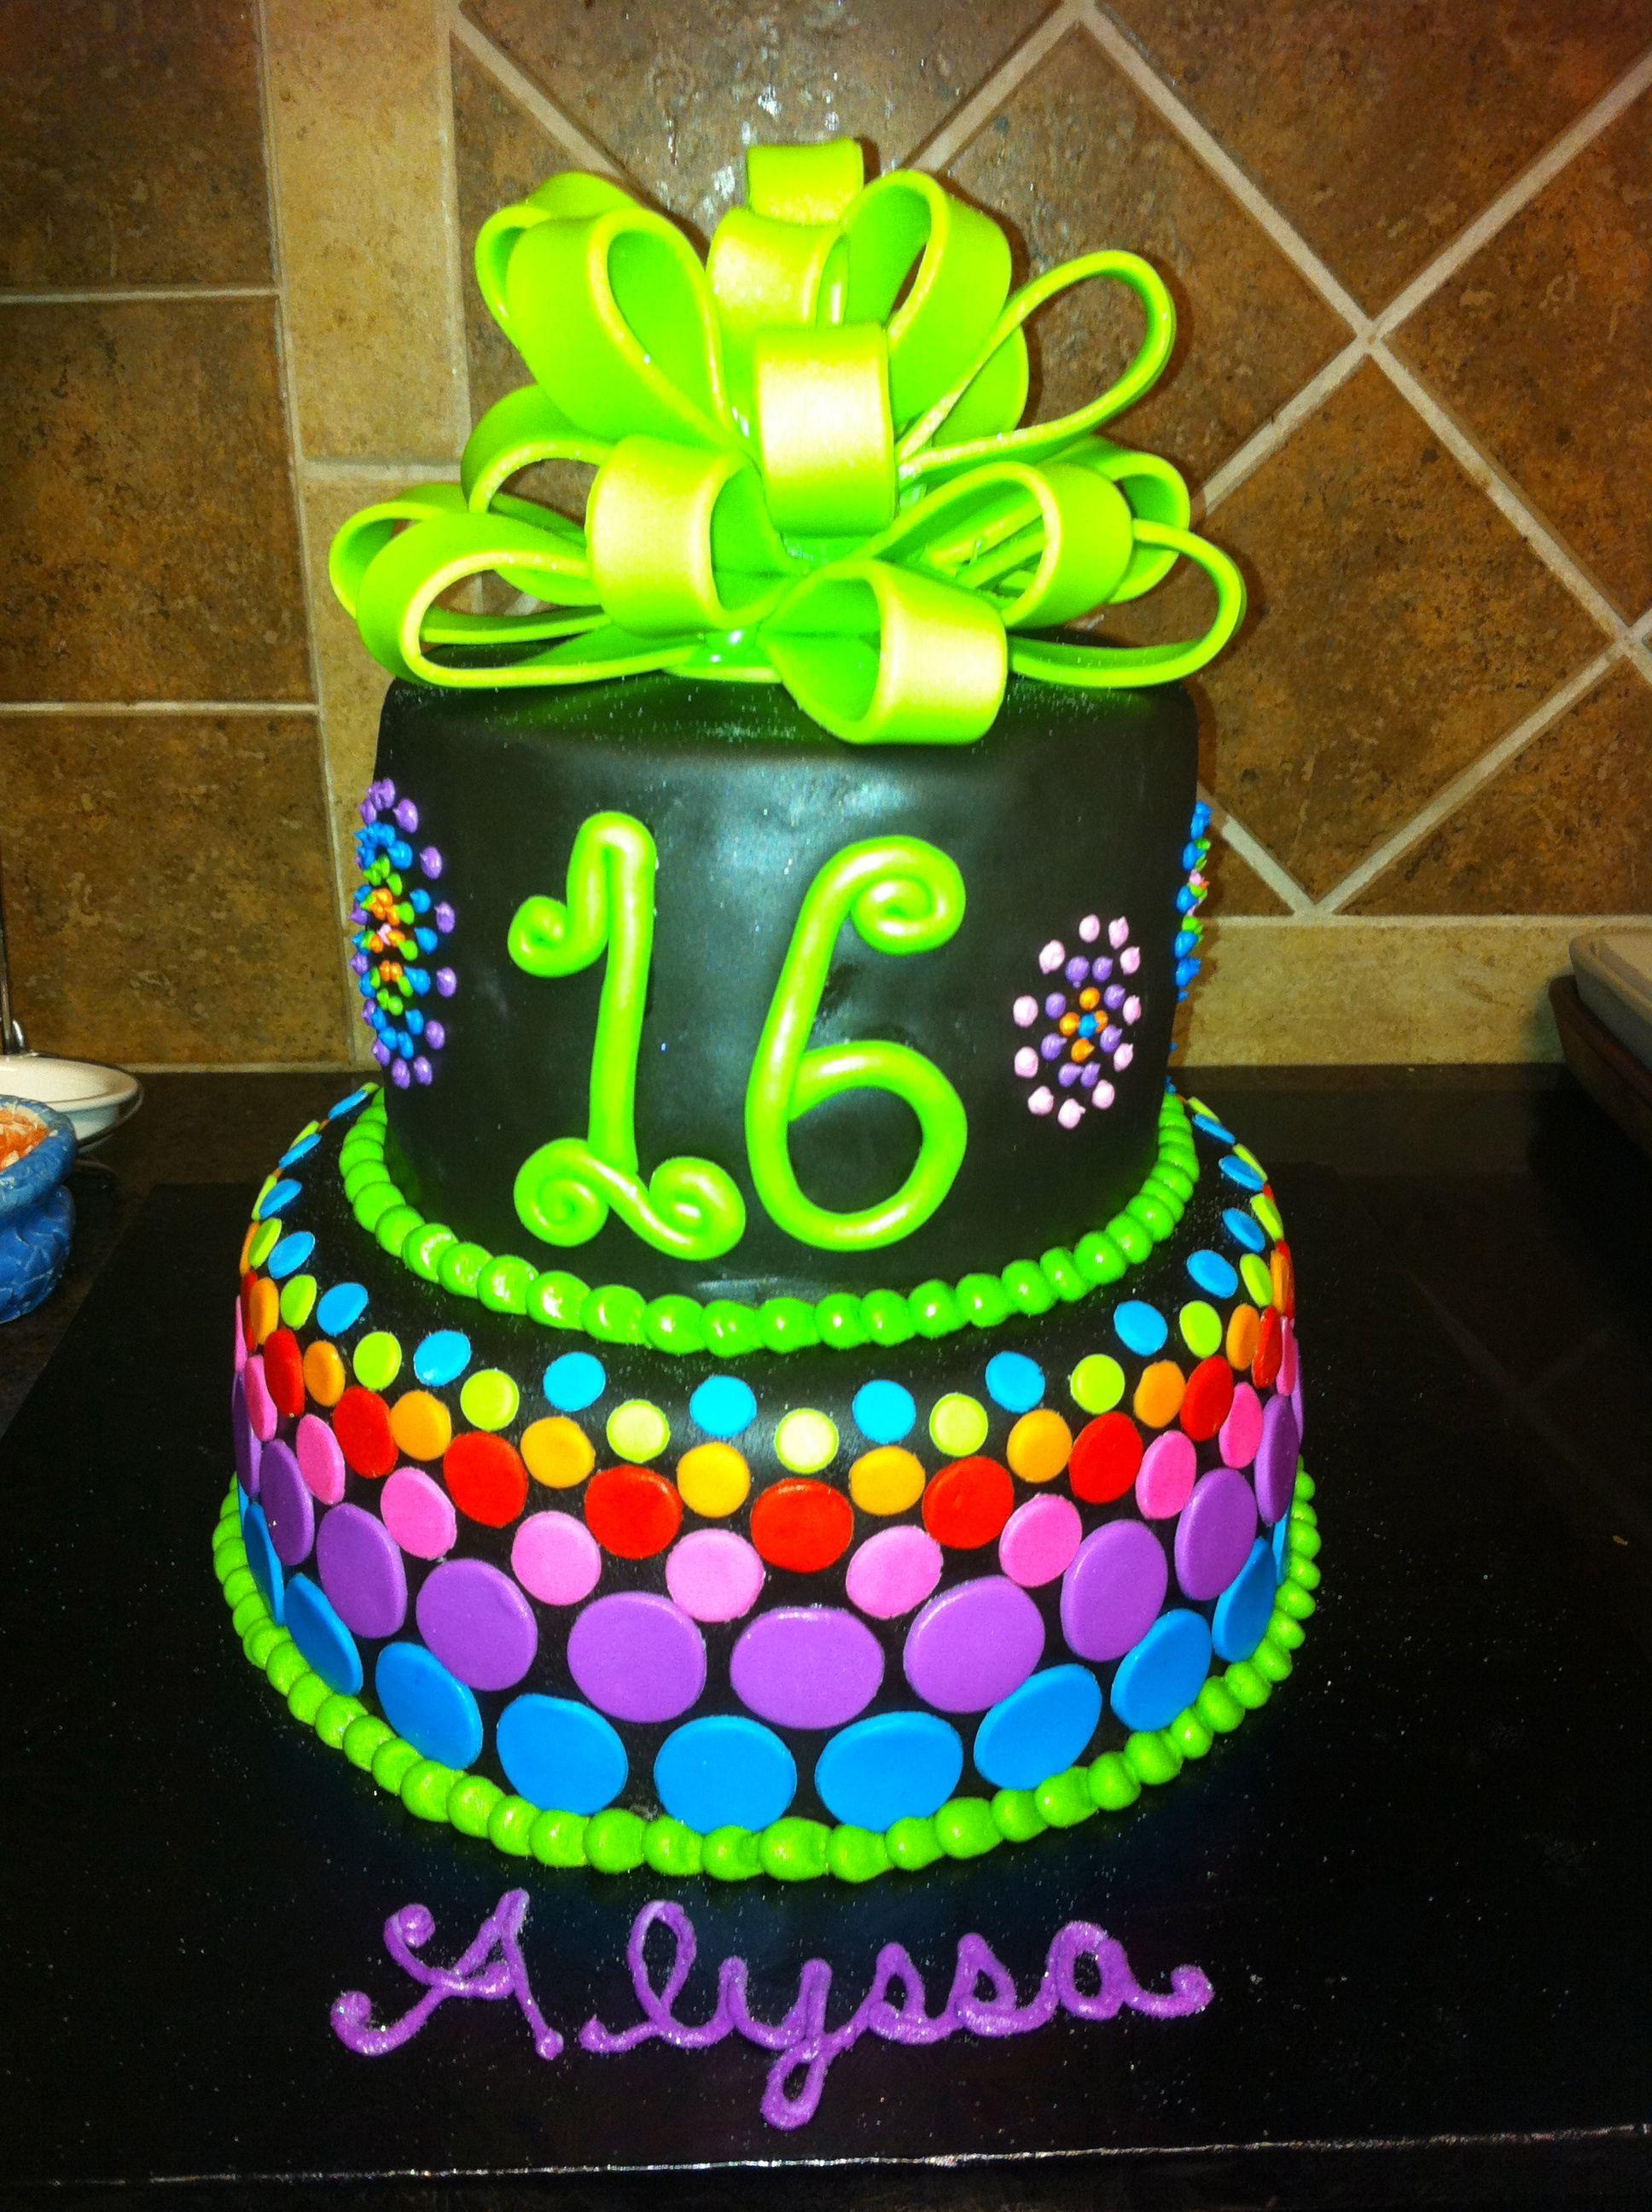 Neon Birthday Cake Things Ive Made Pinterest Neon Birthday - Neon birthday party cakes